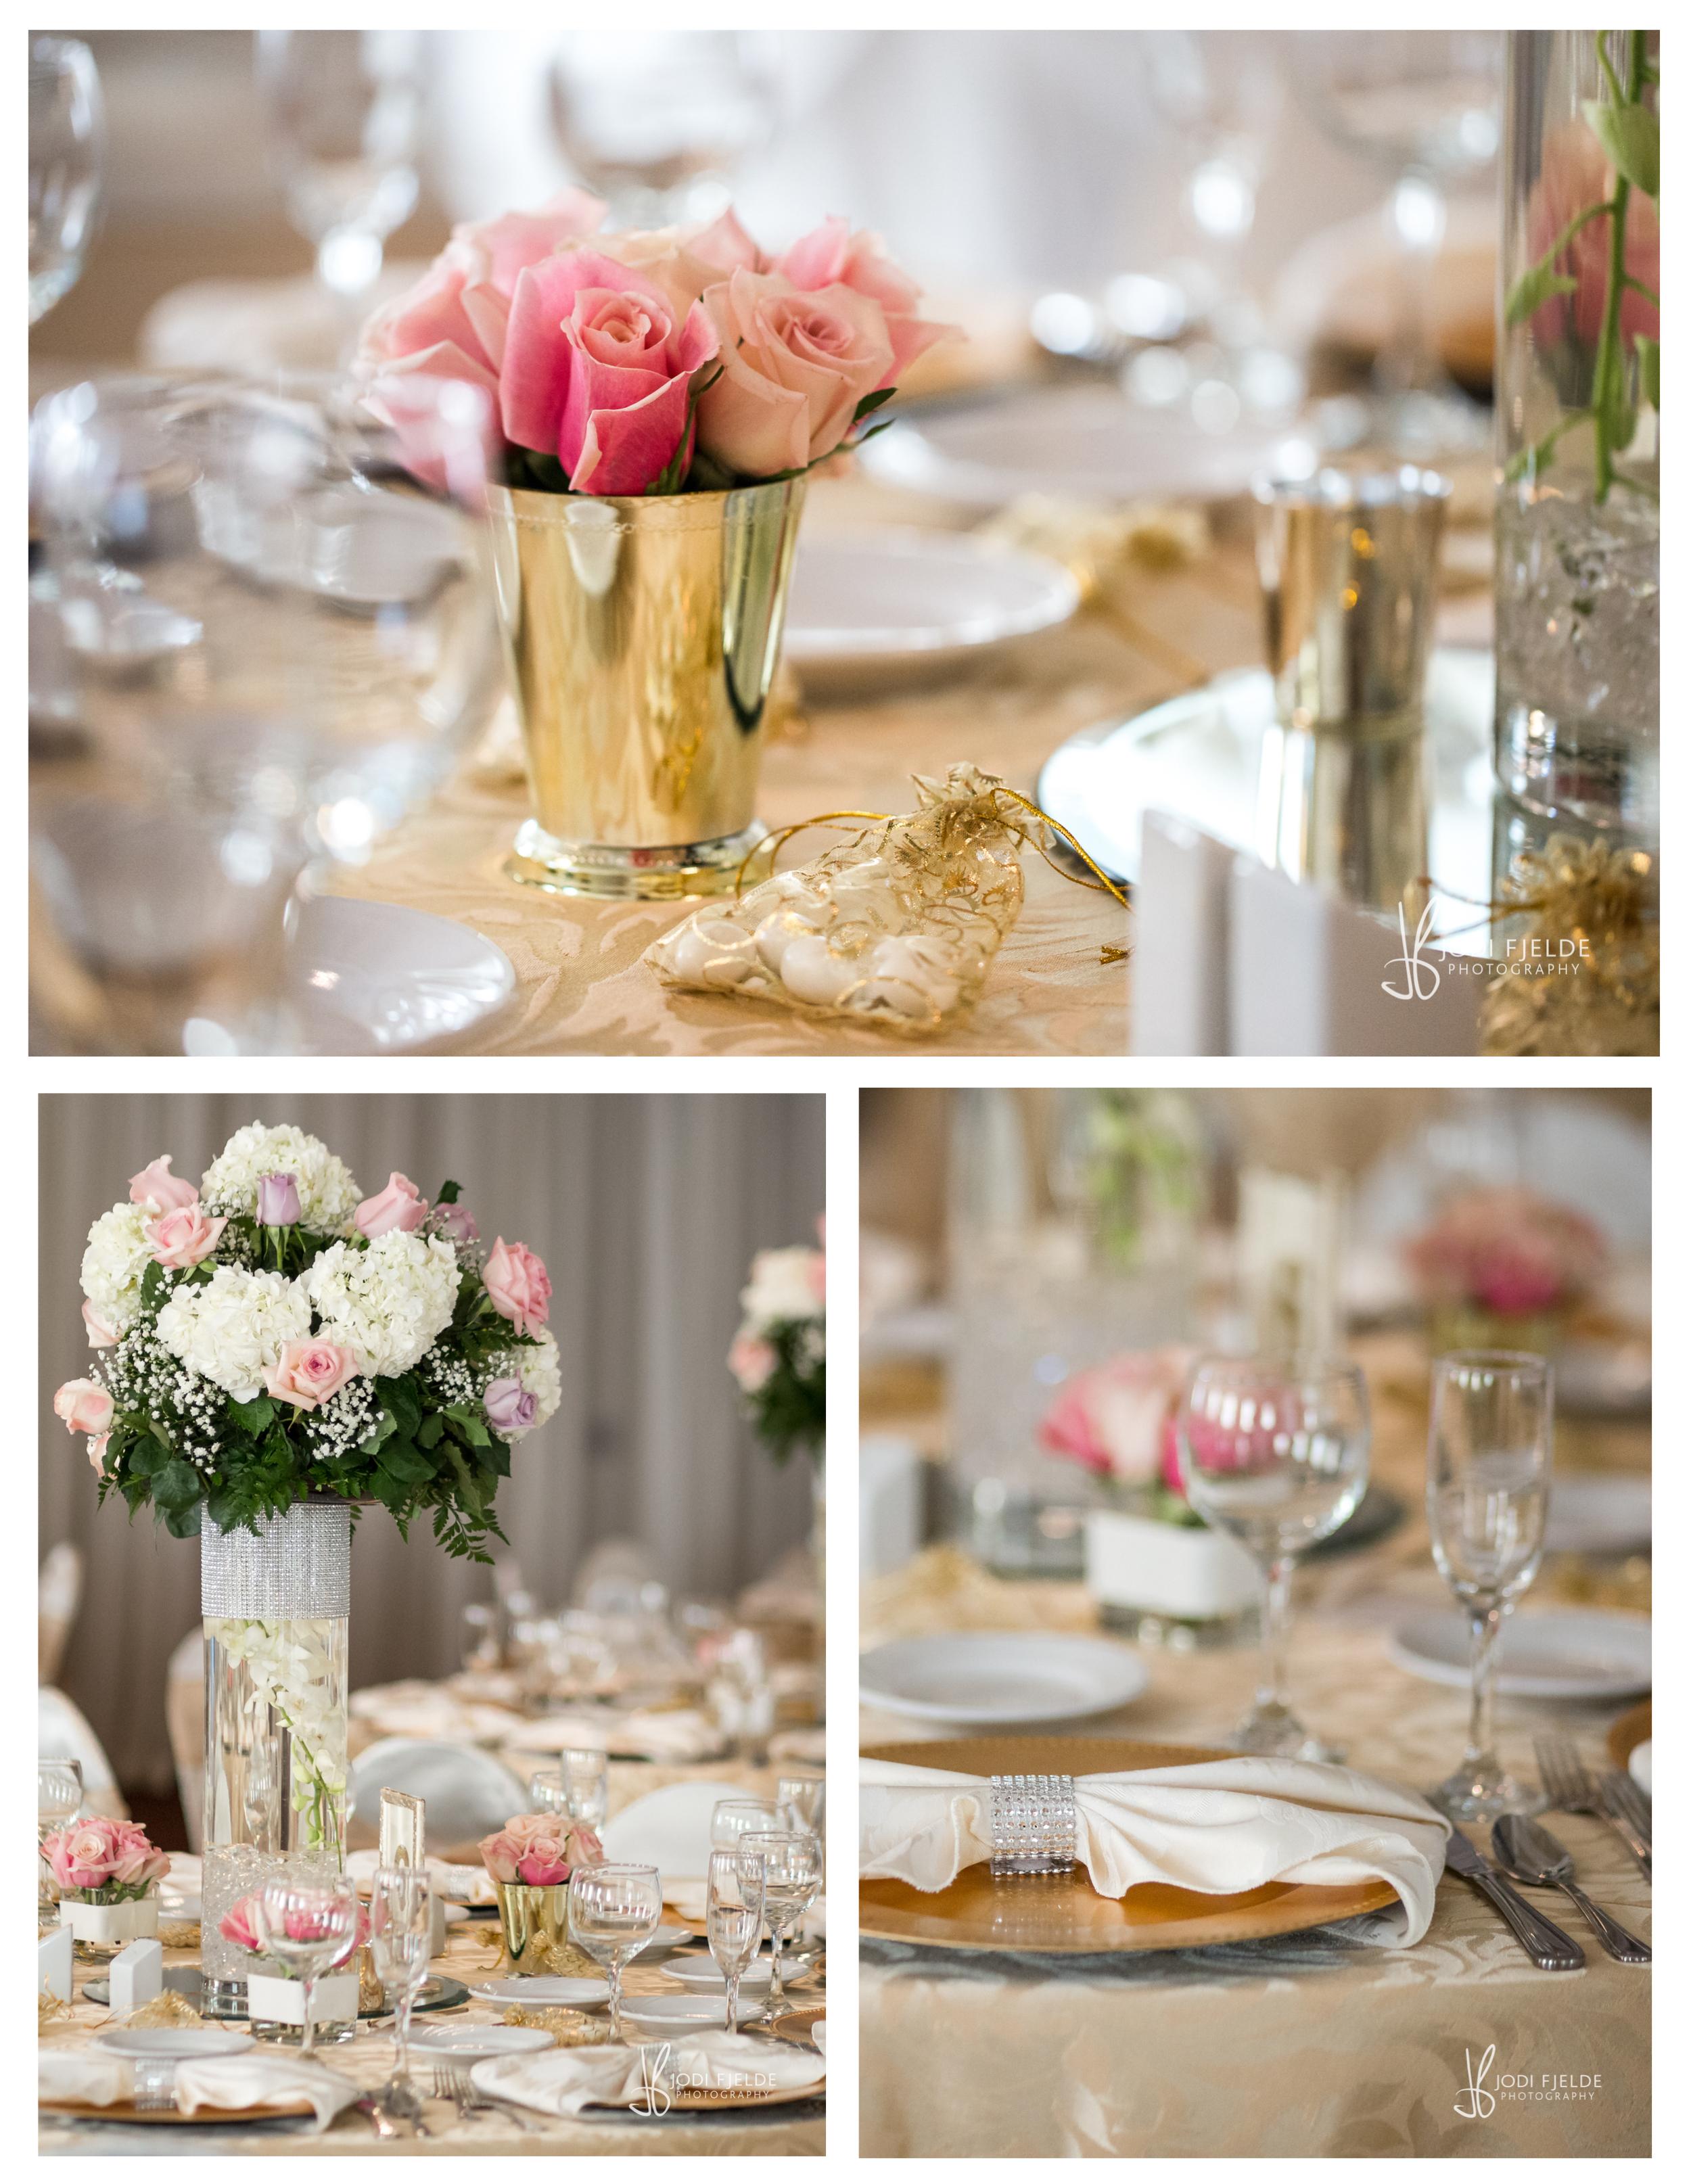 Ballroom Wedding_Ft Lauderdale_Florida_wedding_Maria_&_Juan_photography_jodi_Fjelde_photography-18.jpg